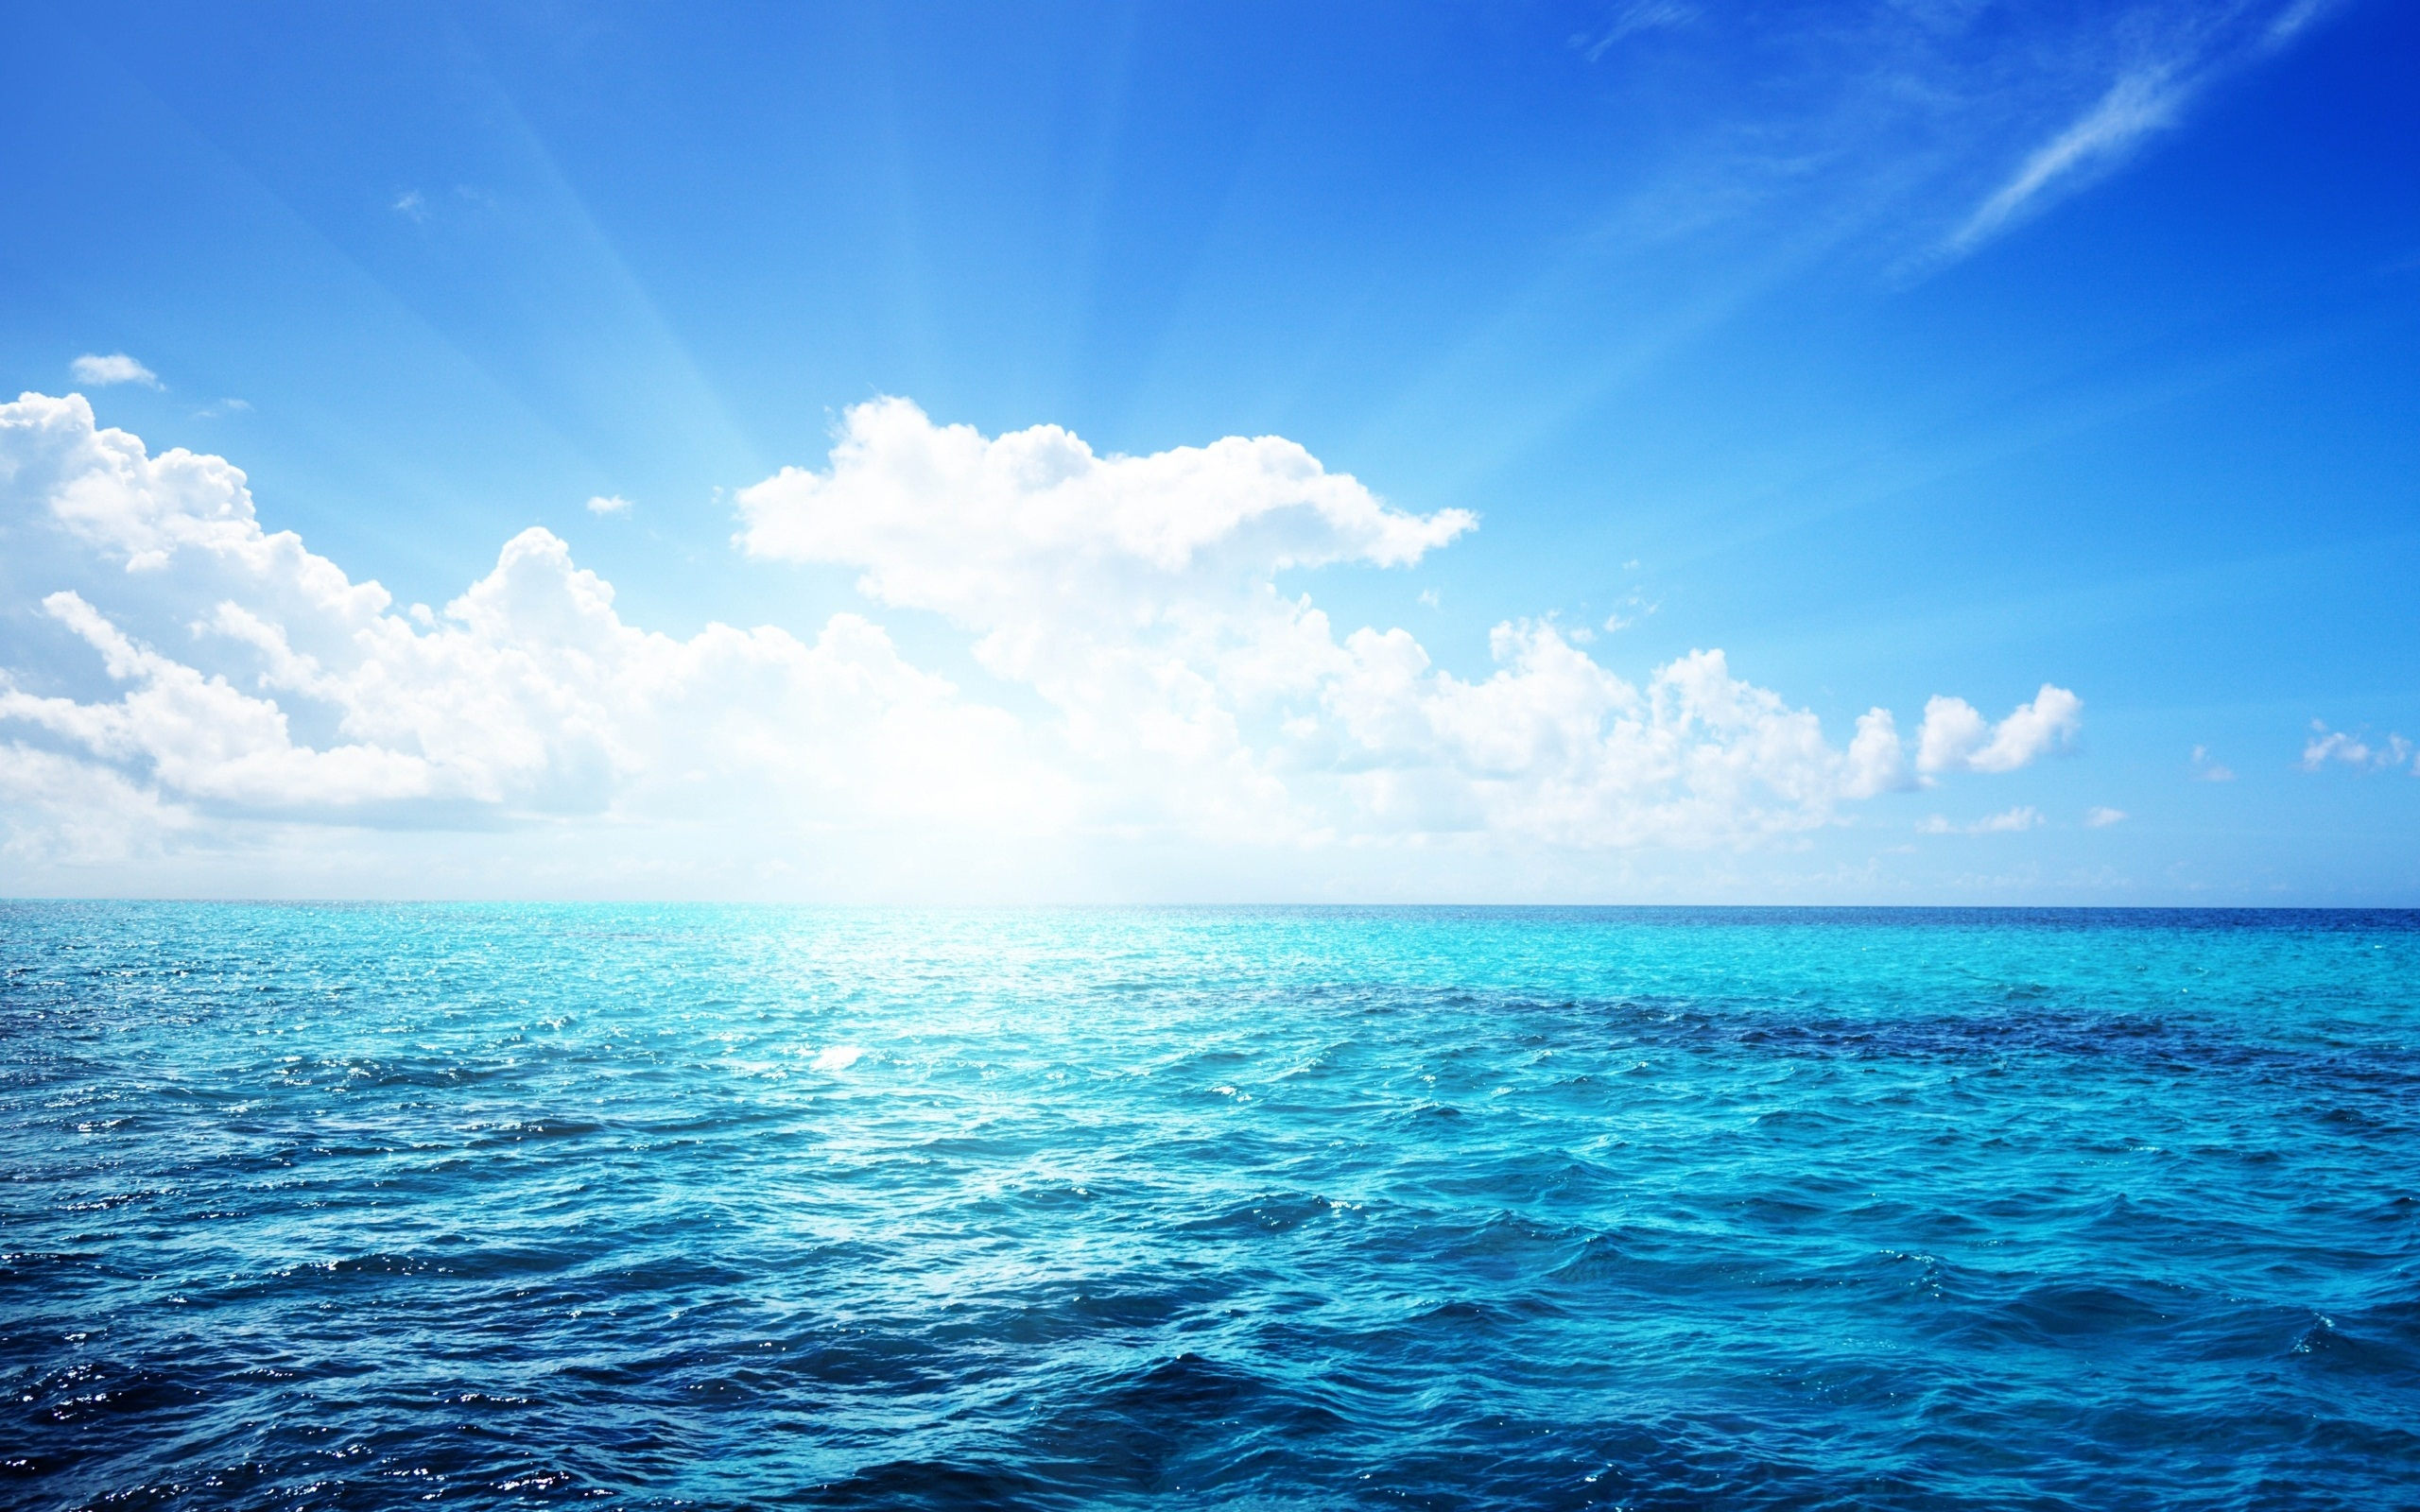 Amazing Sea Wallpaper